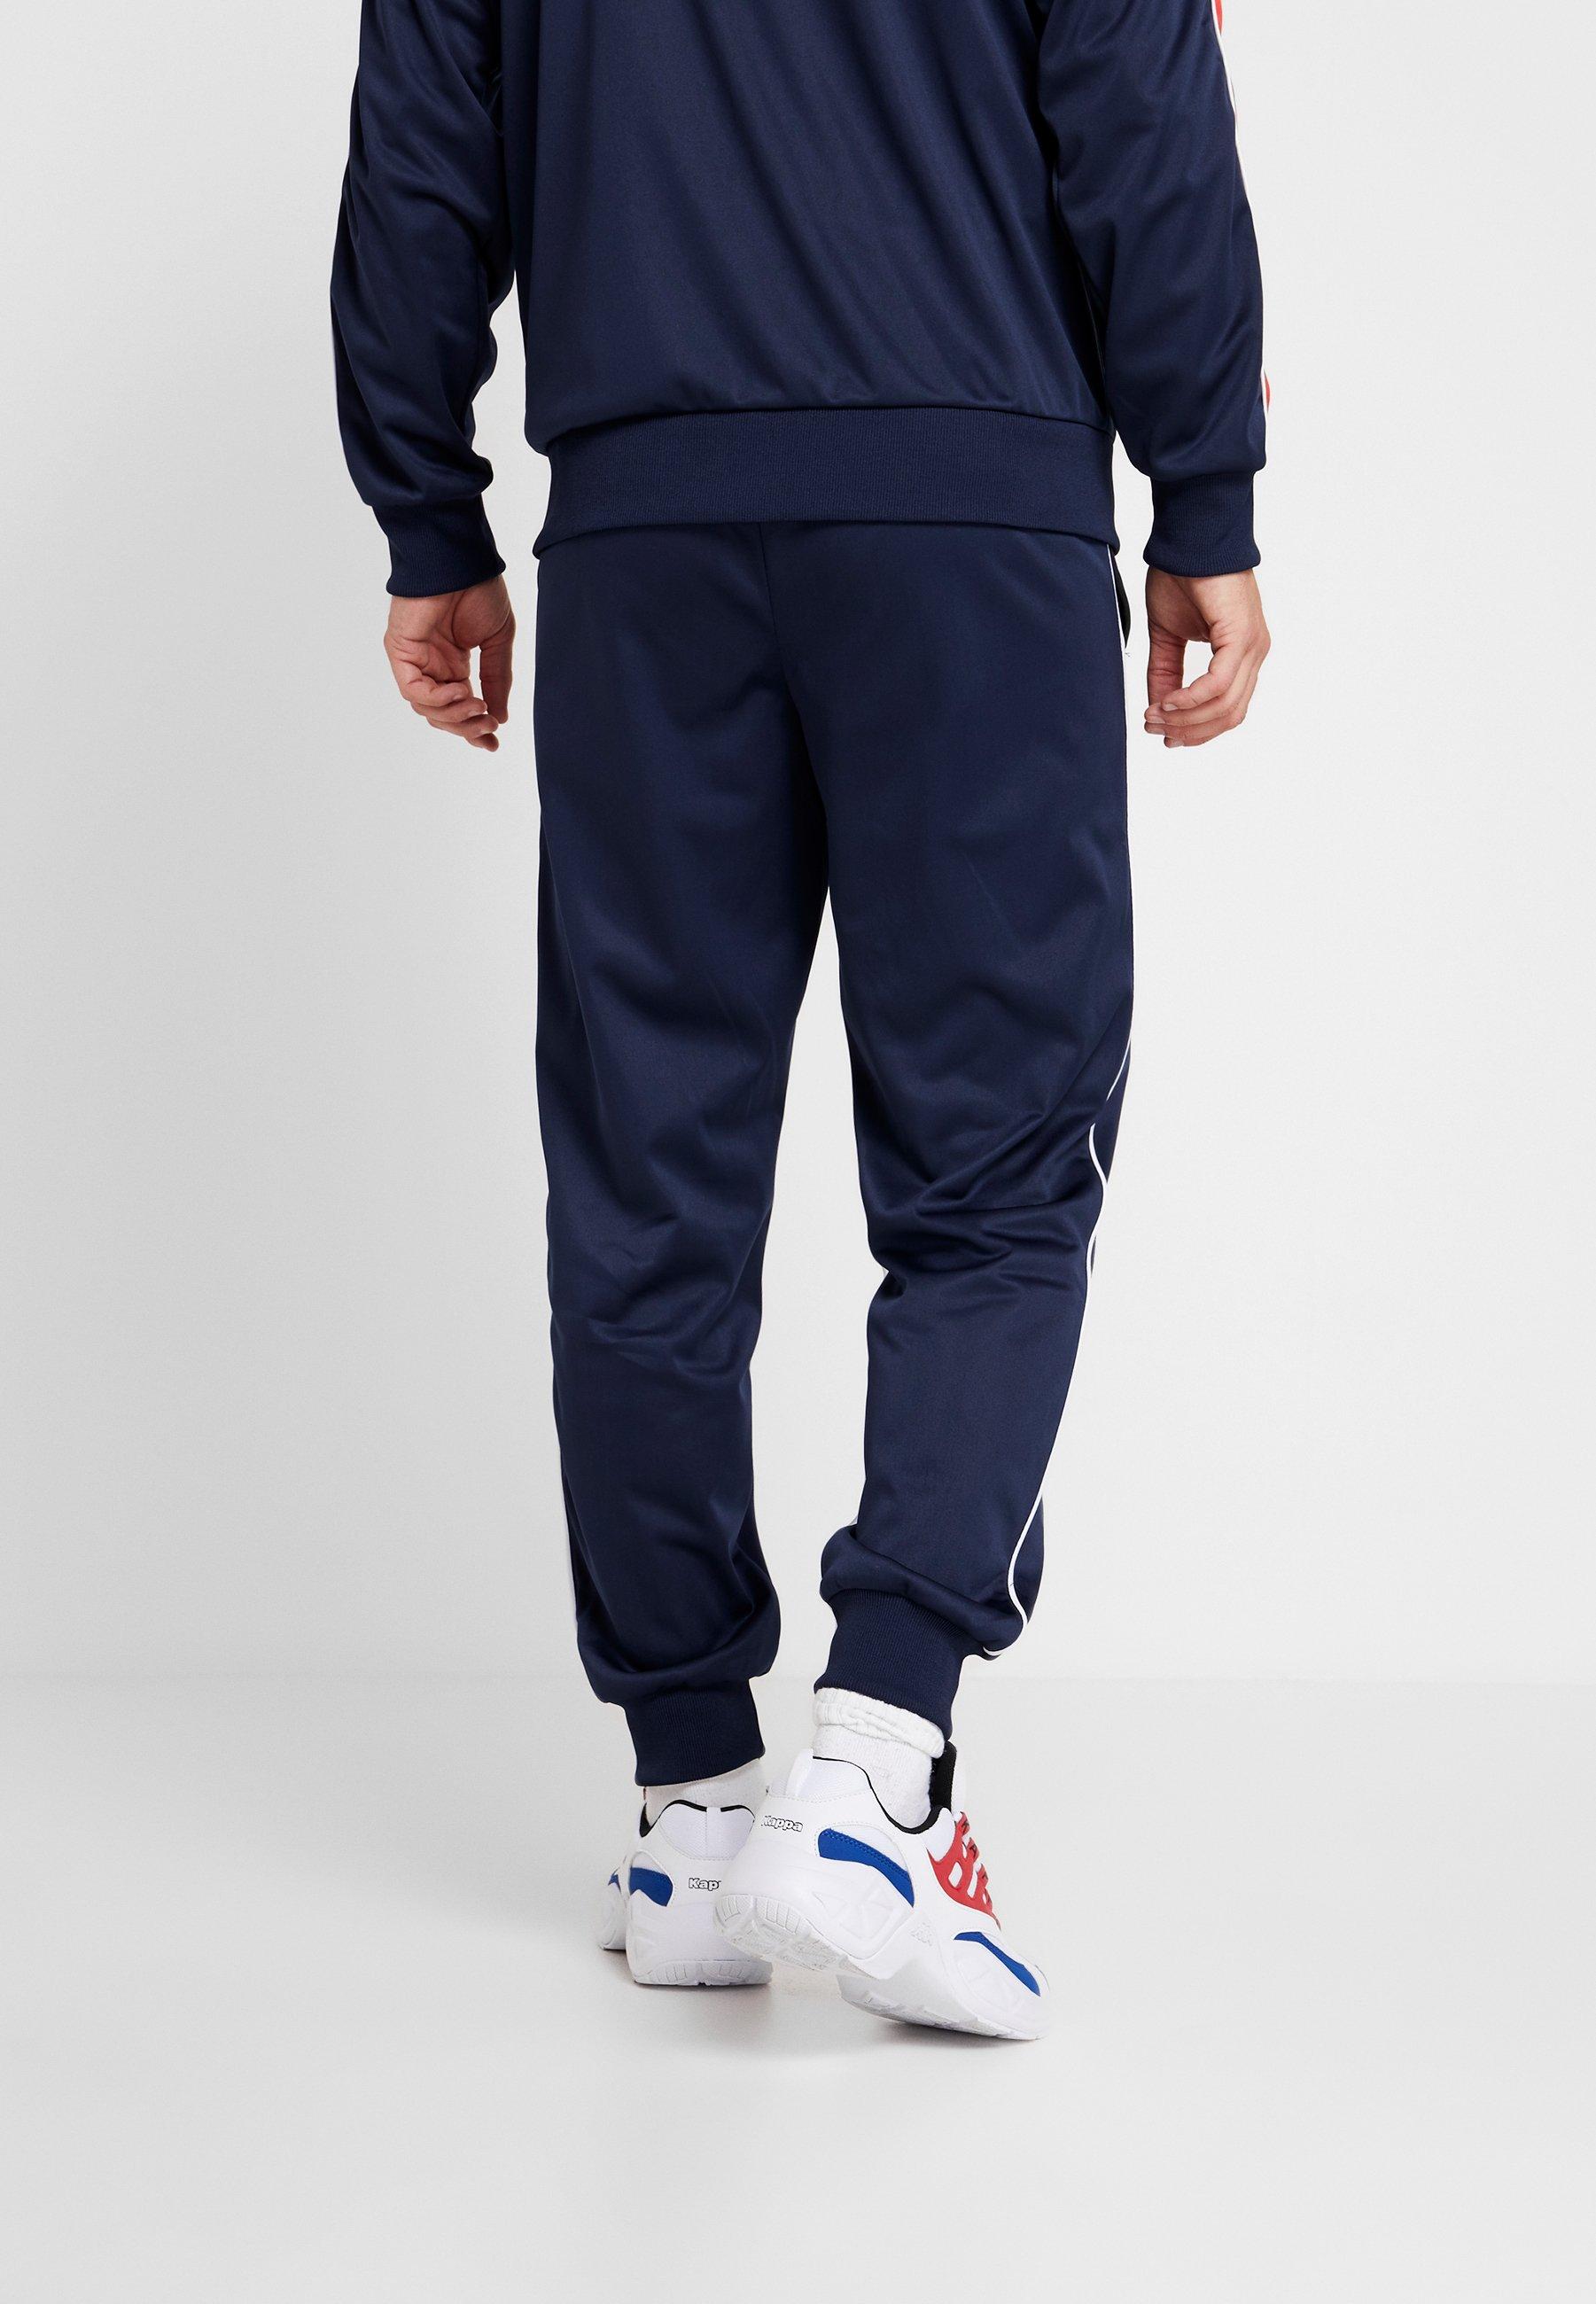 Lotto Lotto CircleSurvêtement Navy Suit Lotto Blue CircleSurvêtement Blue Suit Navy yvP8n0wOmN